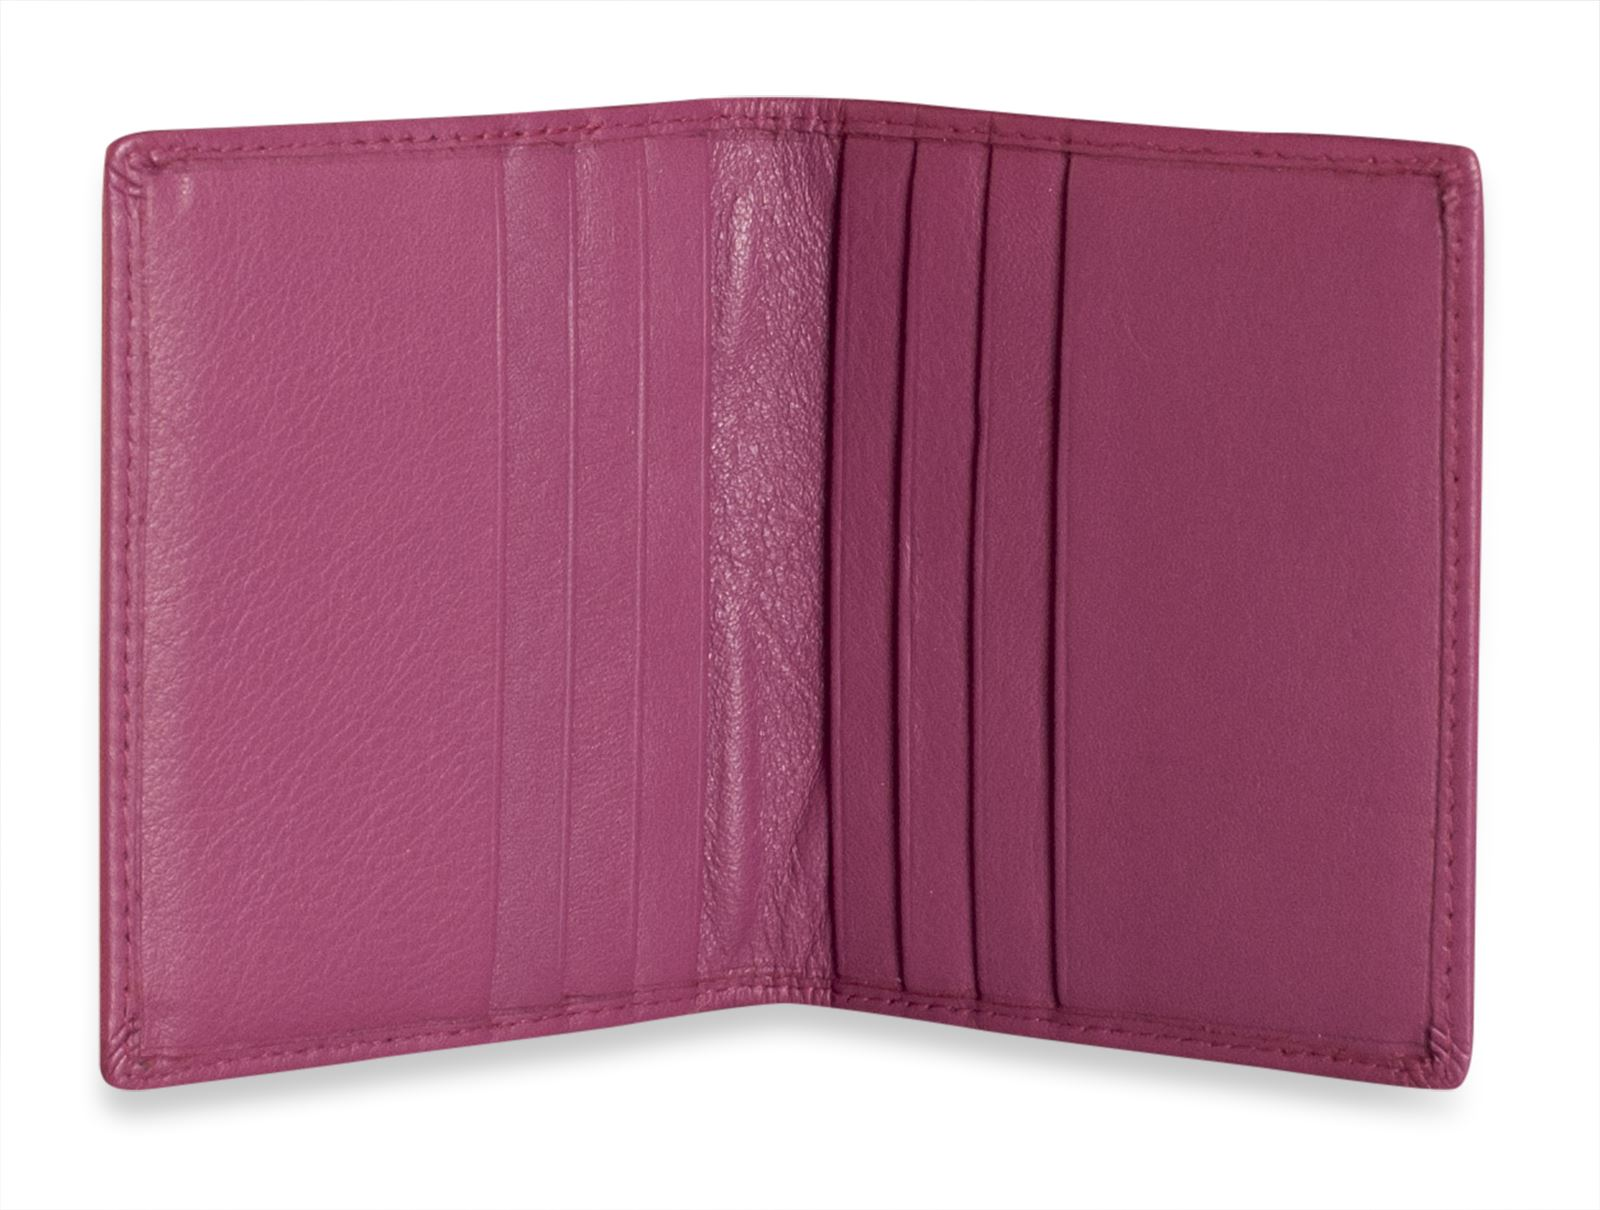 Brunhide Soft Real Leather Credit Card Holder Wallet Business ID